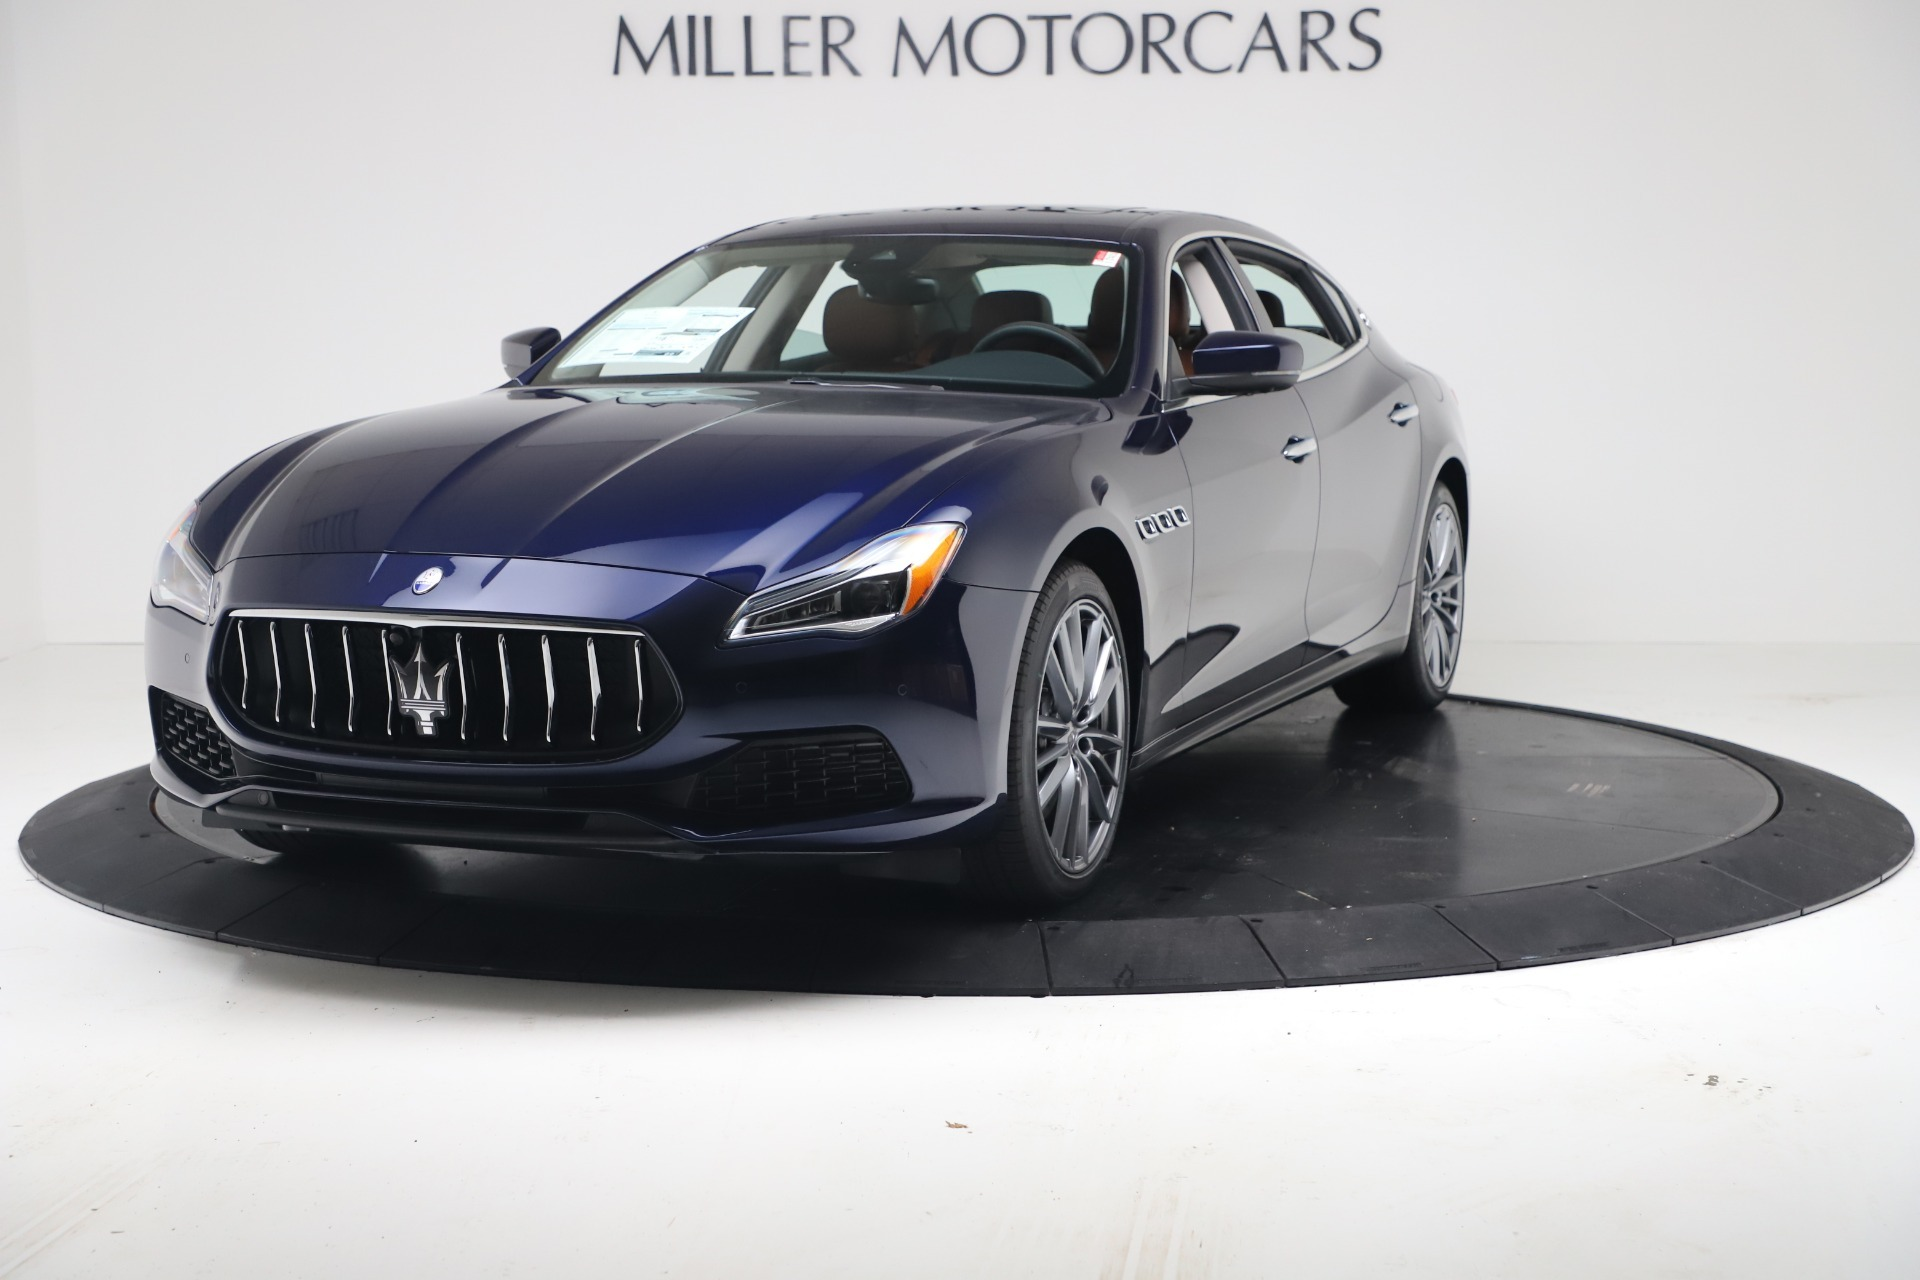 New 2020 Maserati Quattroporte S Q4 GranLusso for sale $122,185 at Rolls-Royce Motor Cars Greenwich in Greenwich CT 06830 1